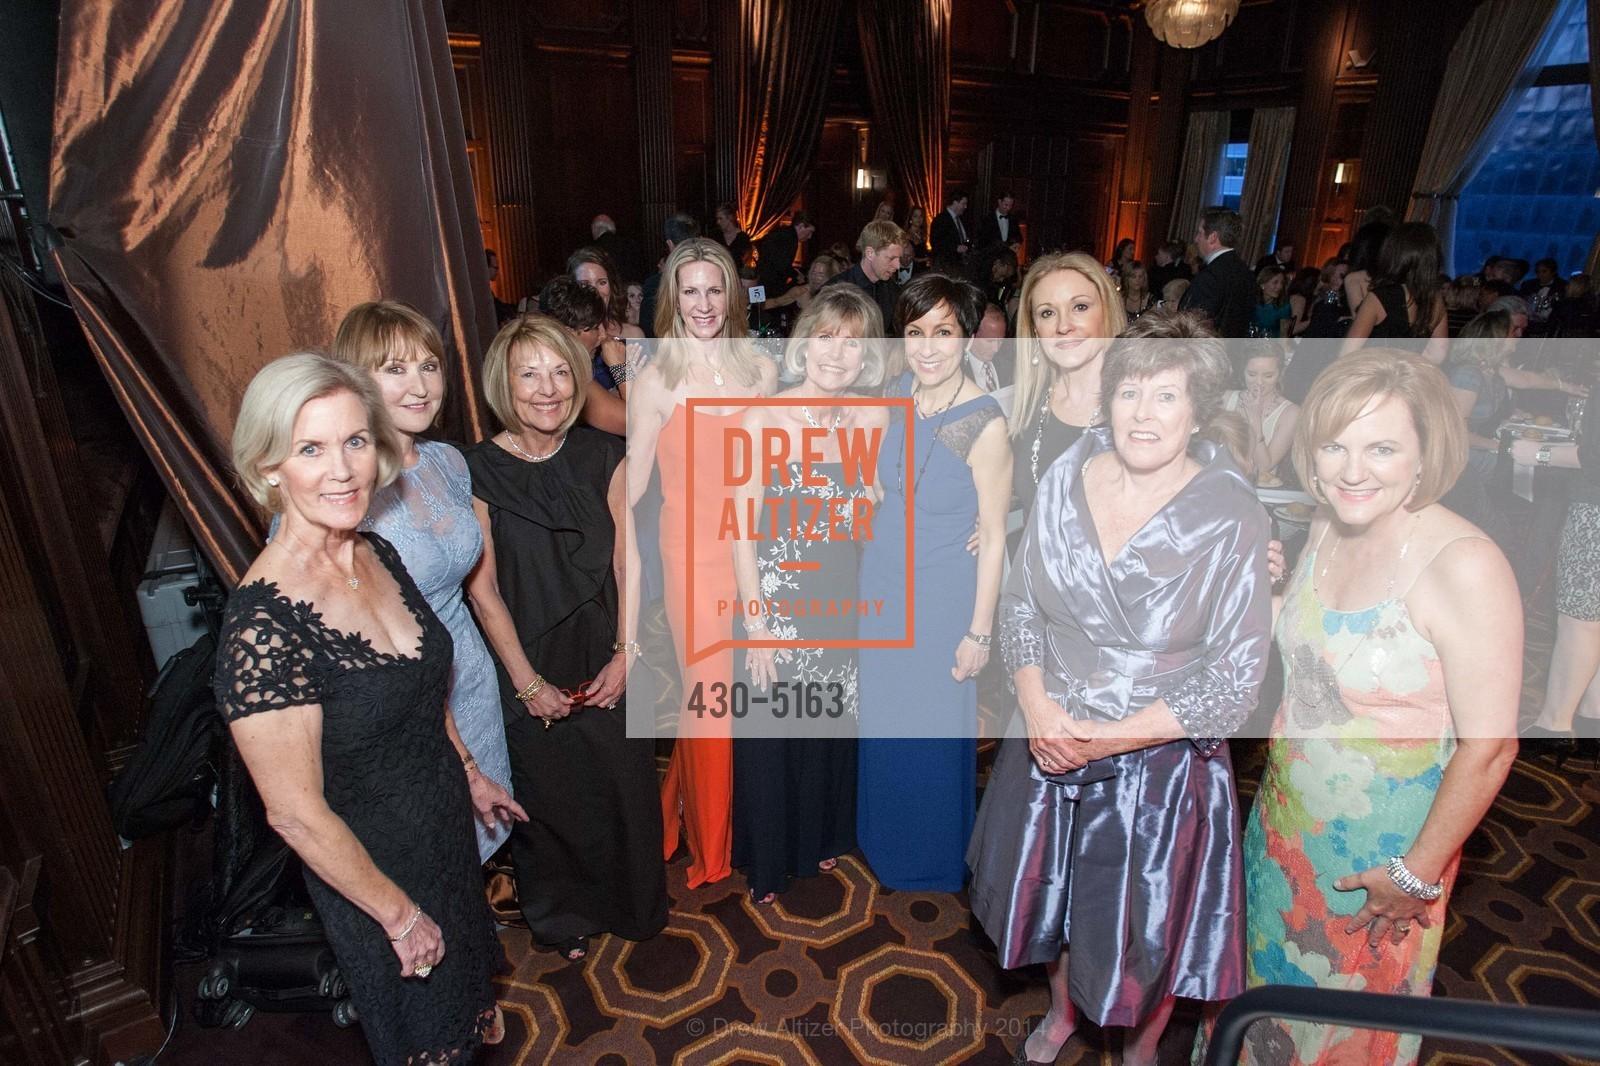 Susie Finney, Linda Leal, Debbie Bocchi, Wels Hamilton, Patti Rueff, Shelly McGraw, Linda Vaughn, Charlotte McFadden, Photo #430-5163